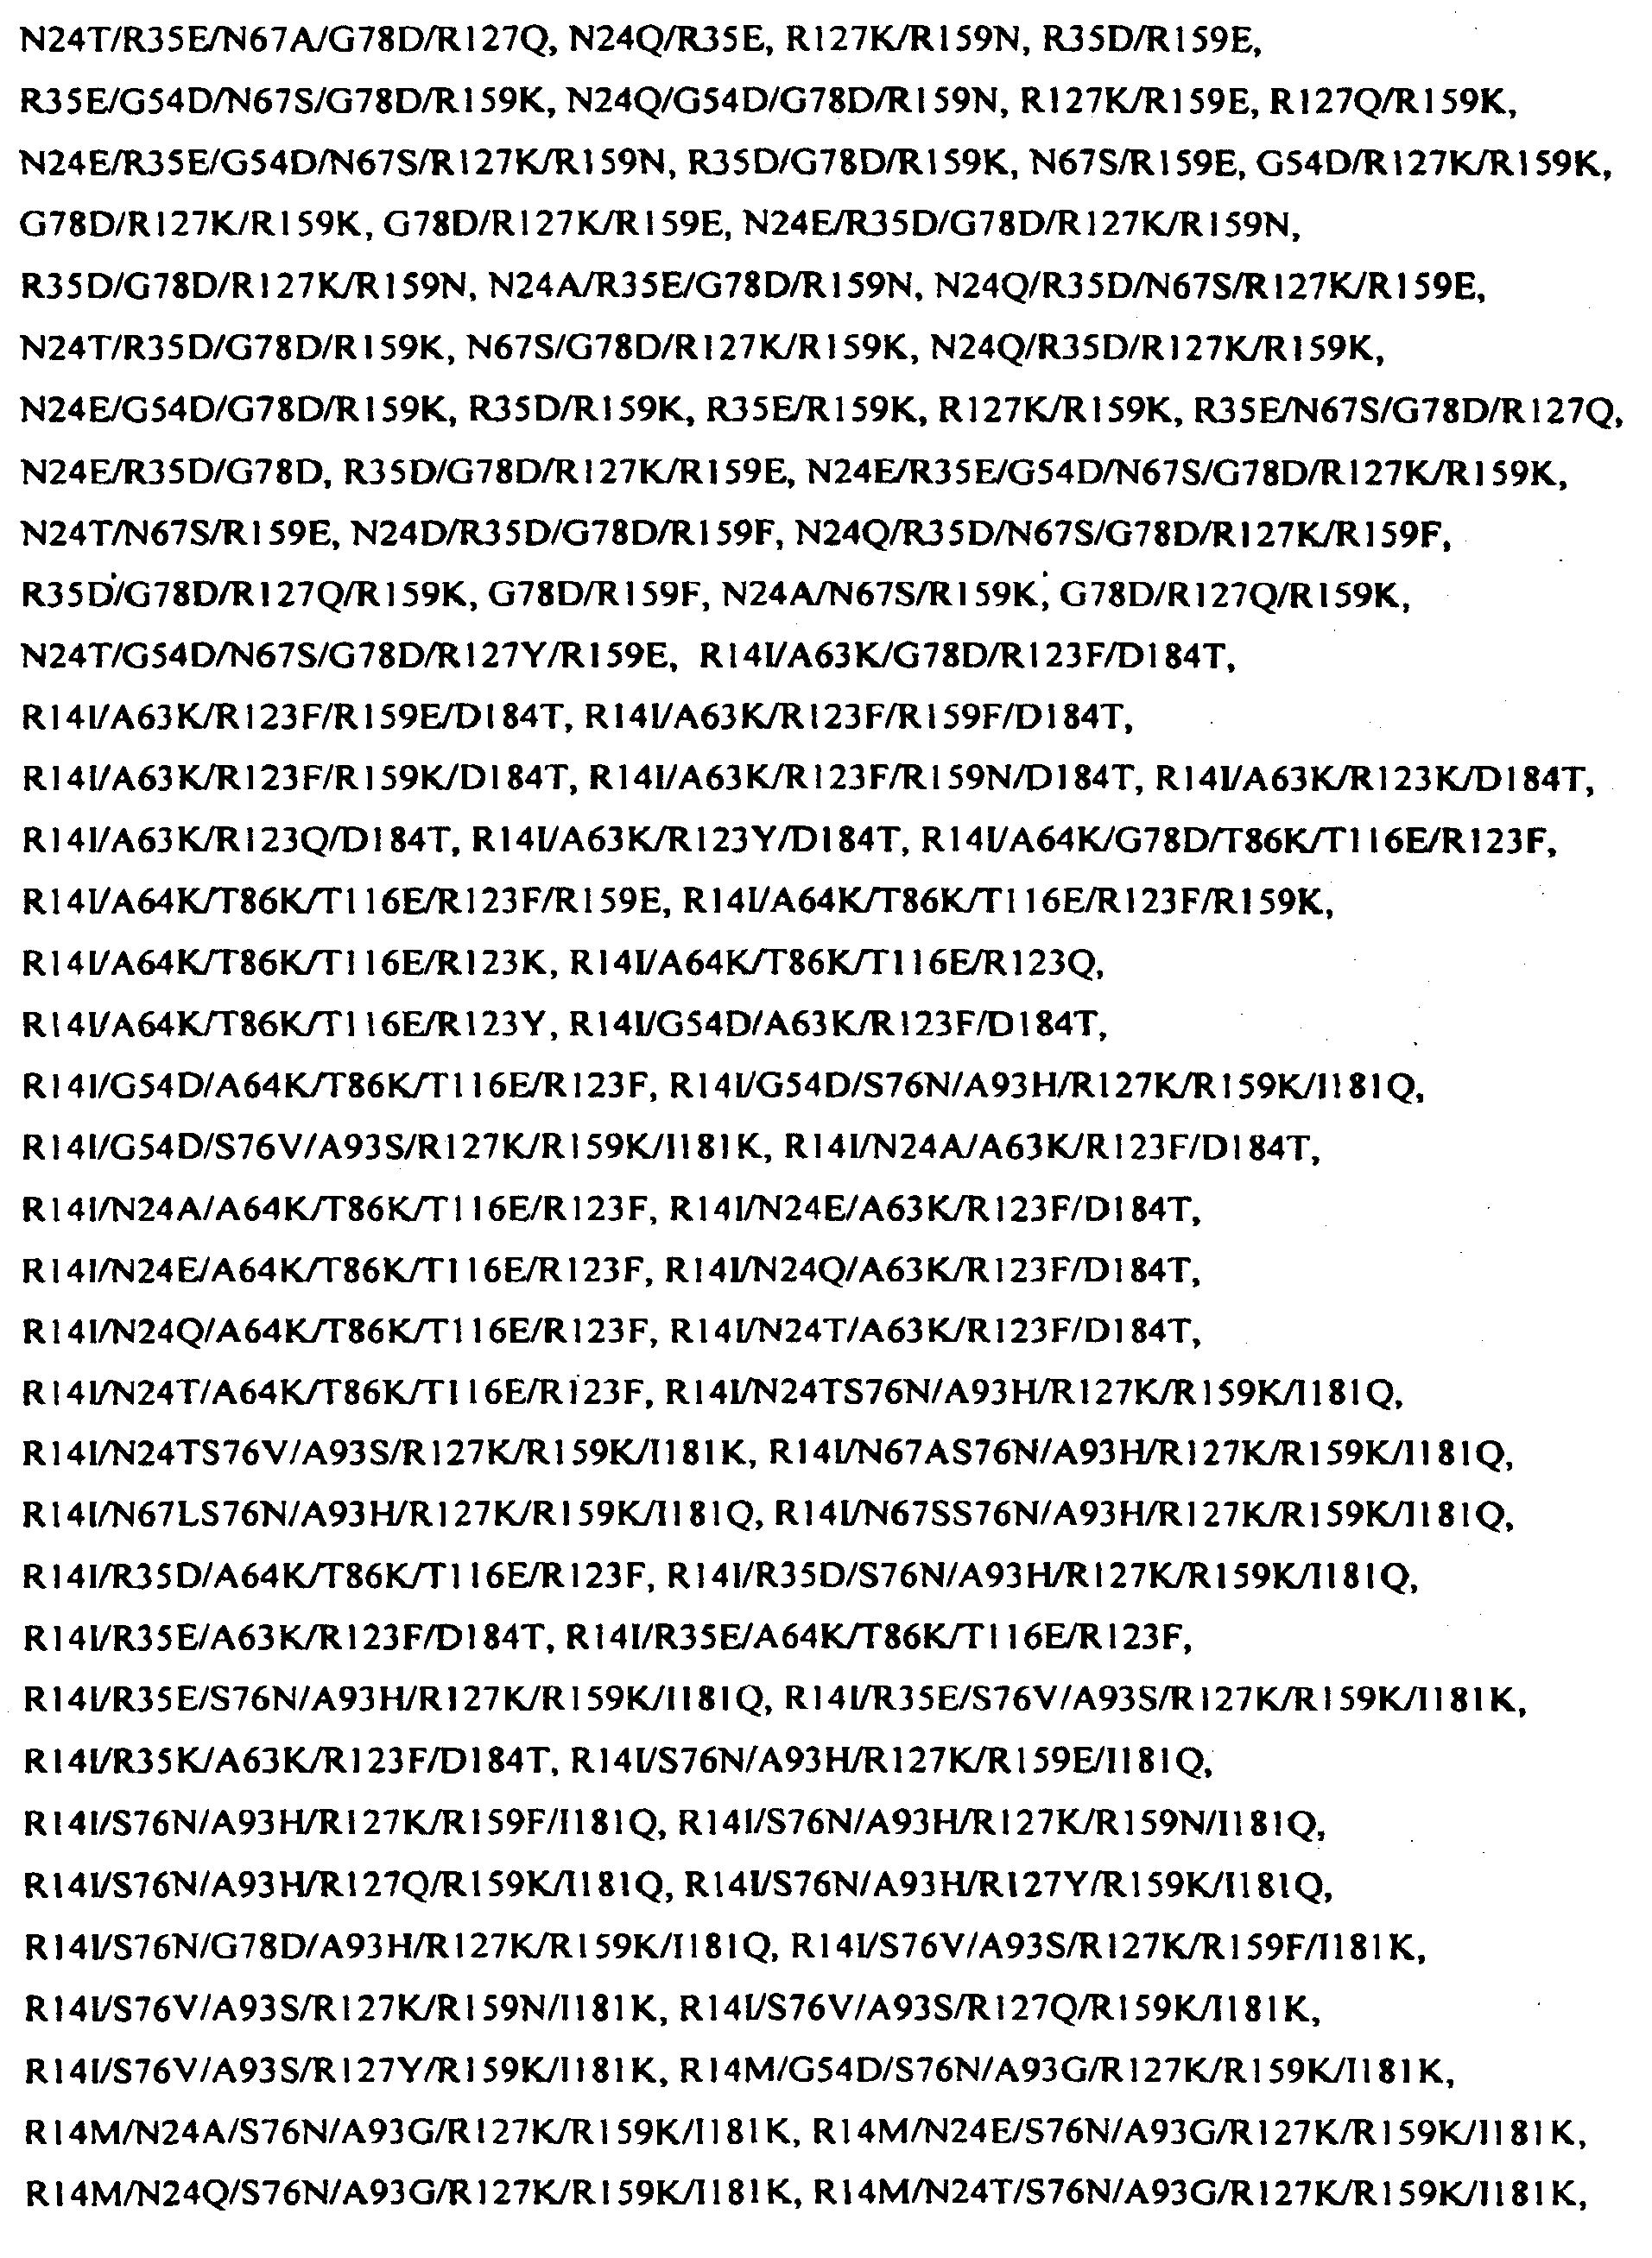 Figure 00000022